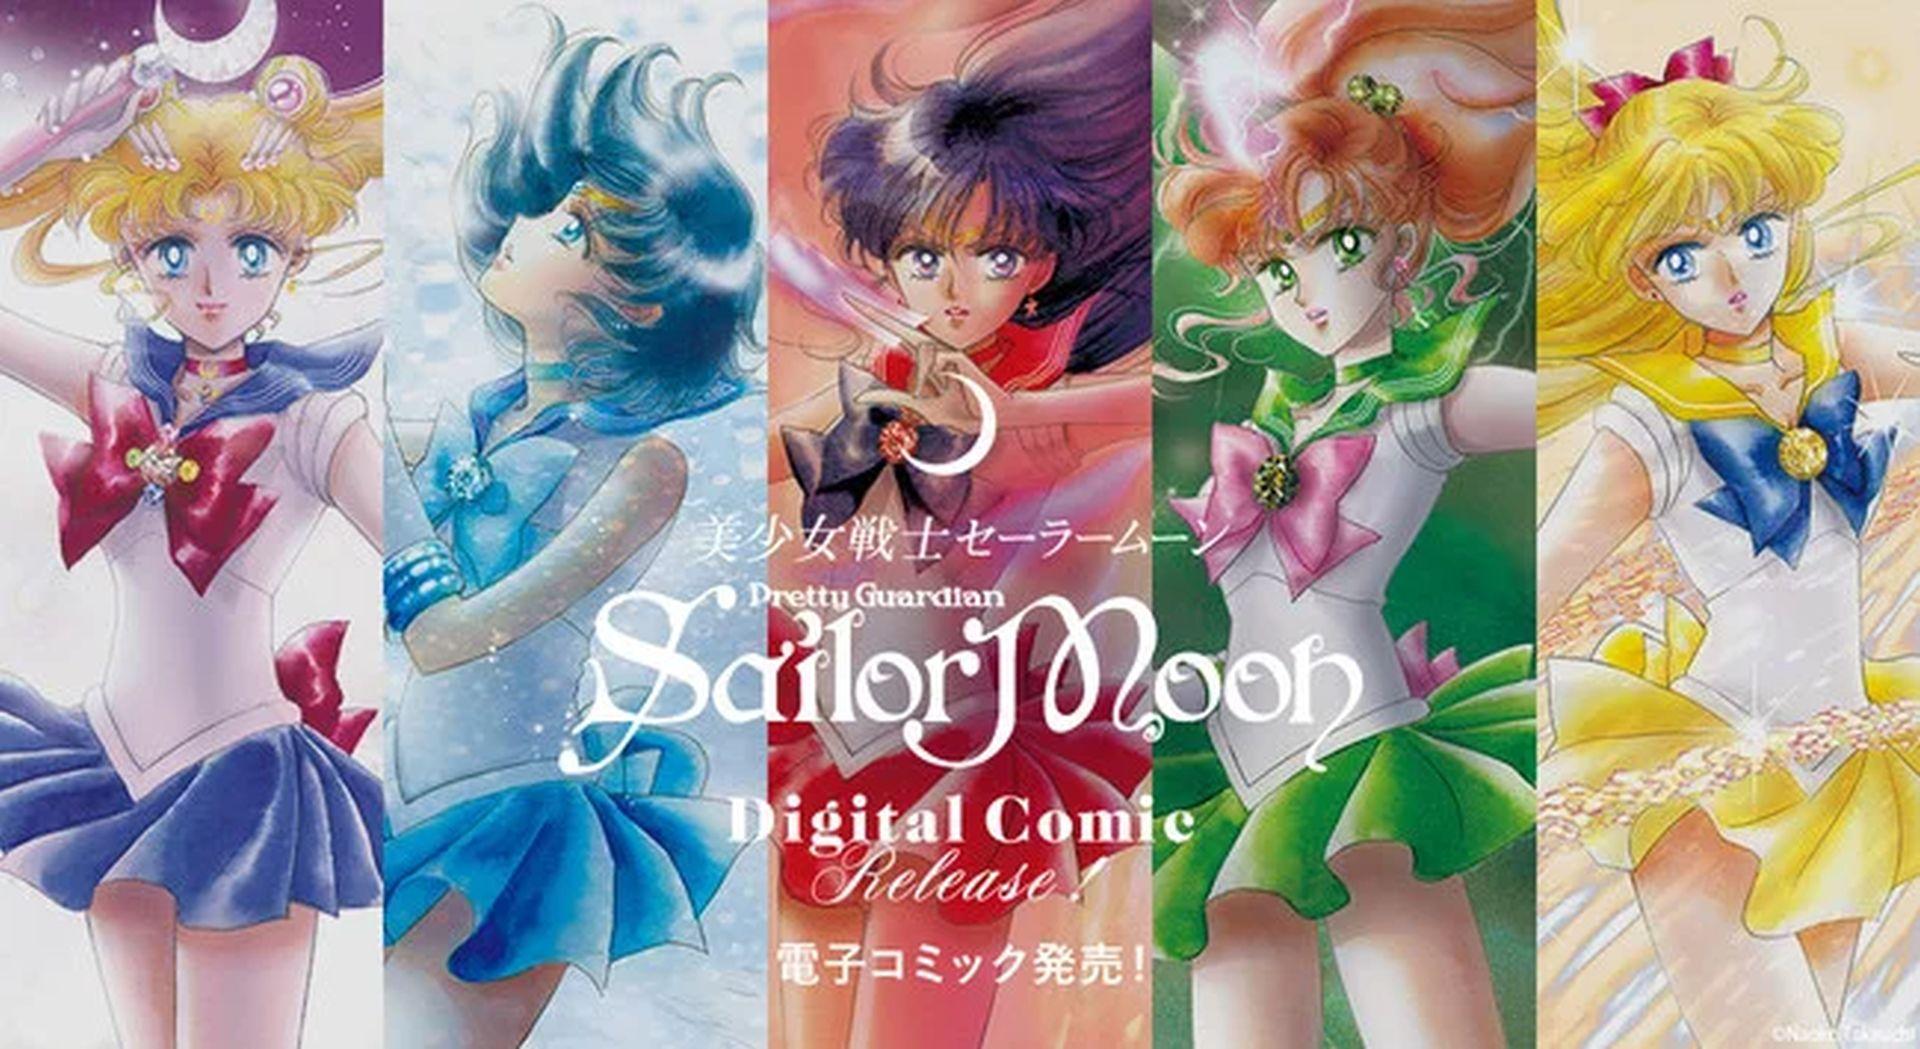 SAILOR MOON ETERNAL EDITION Manga Gets English Digital